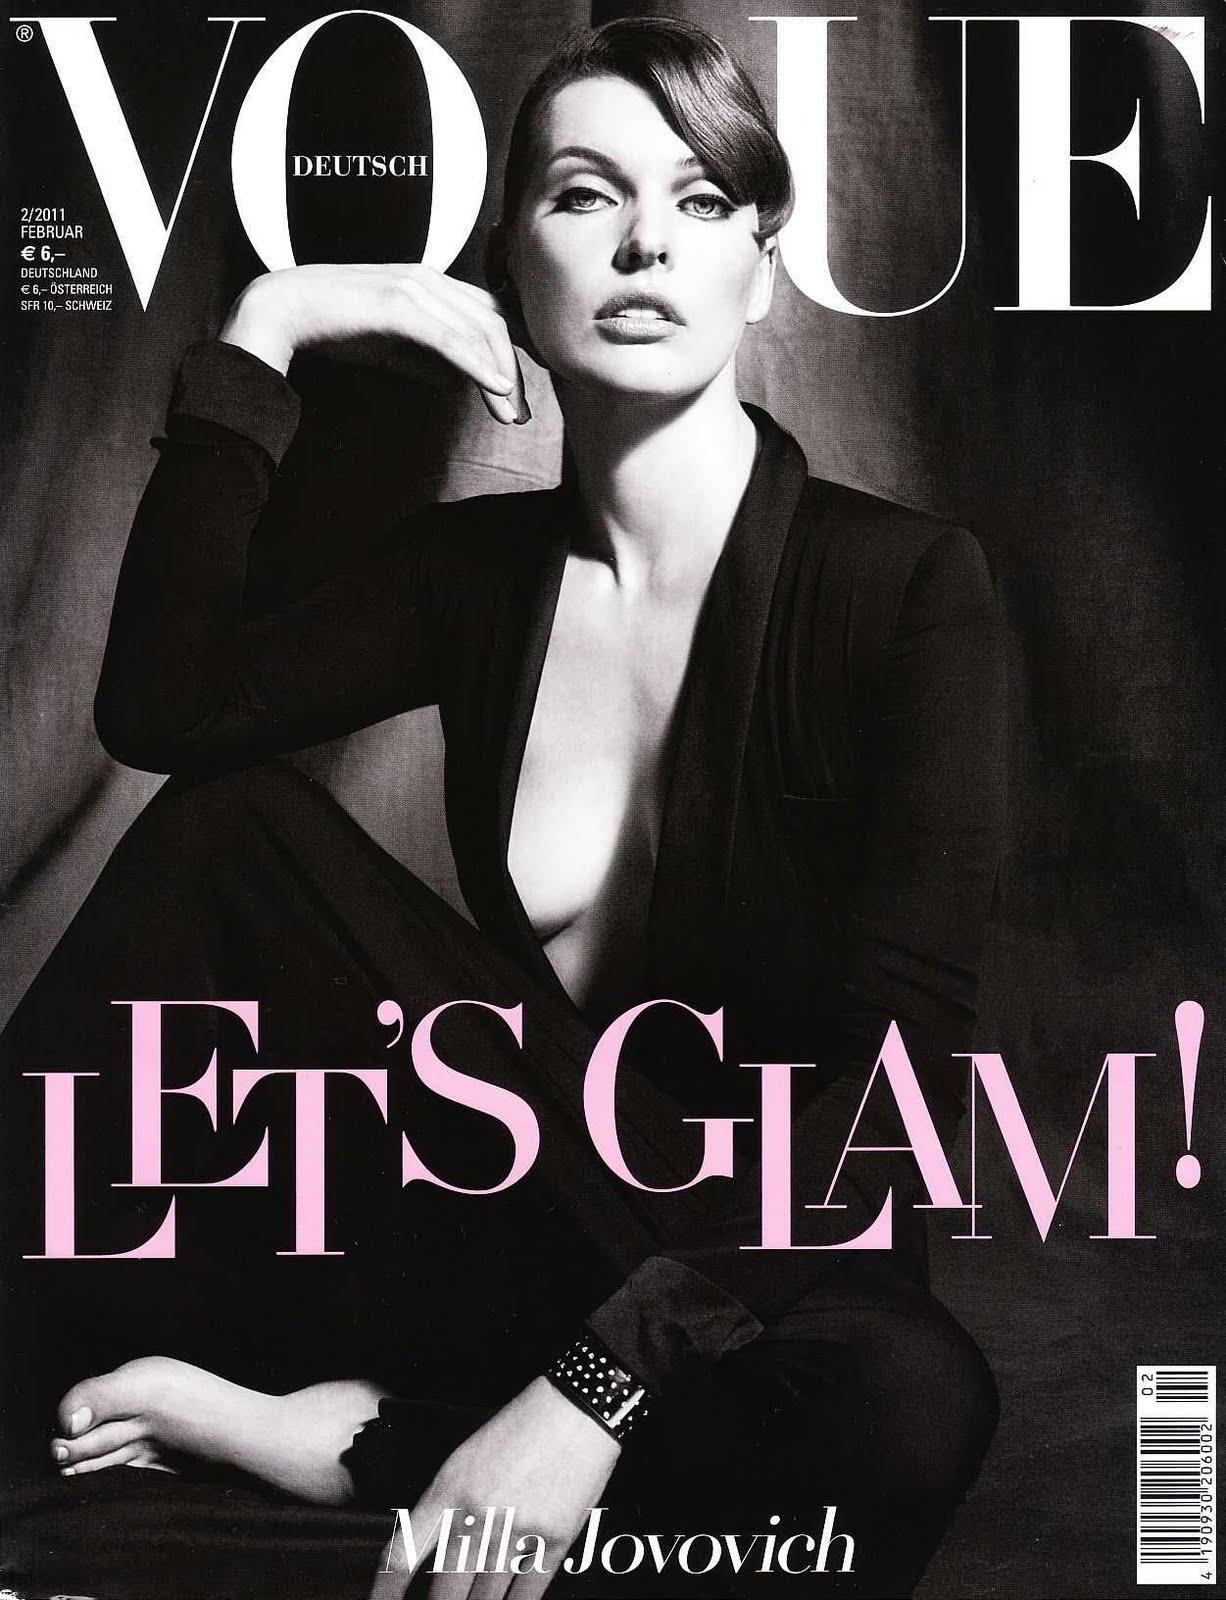 http://1.bp.blogspot.com/-VcbVe3mRyQ8/TWrndUcPlGI/AAAAAAAAIns/NSq9Le9AGOg/s1600/Vogue%2BGermany%2B%2528Milla%2BJovovich%2529.jpg